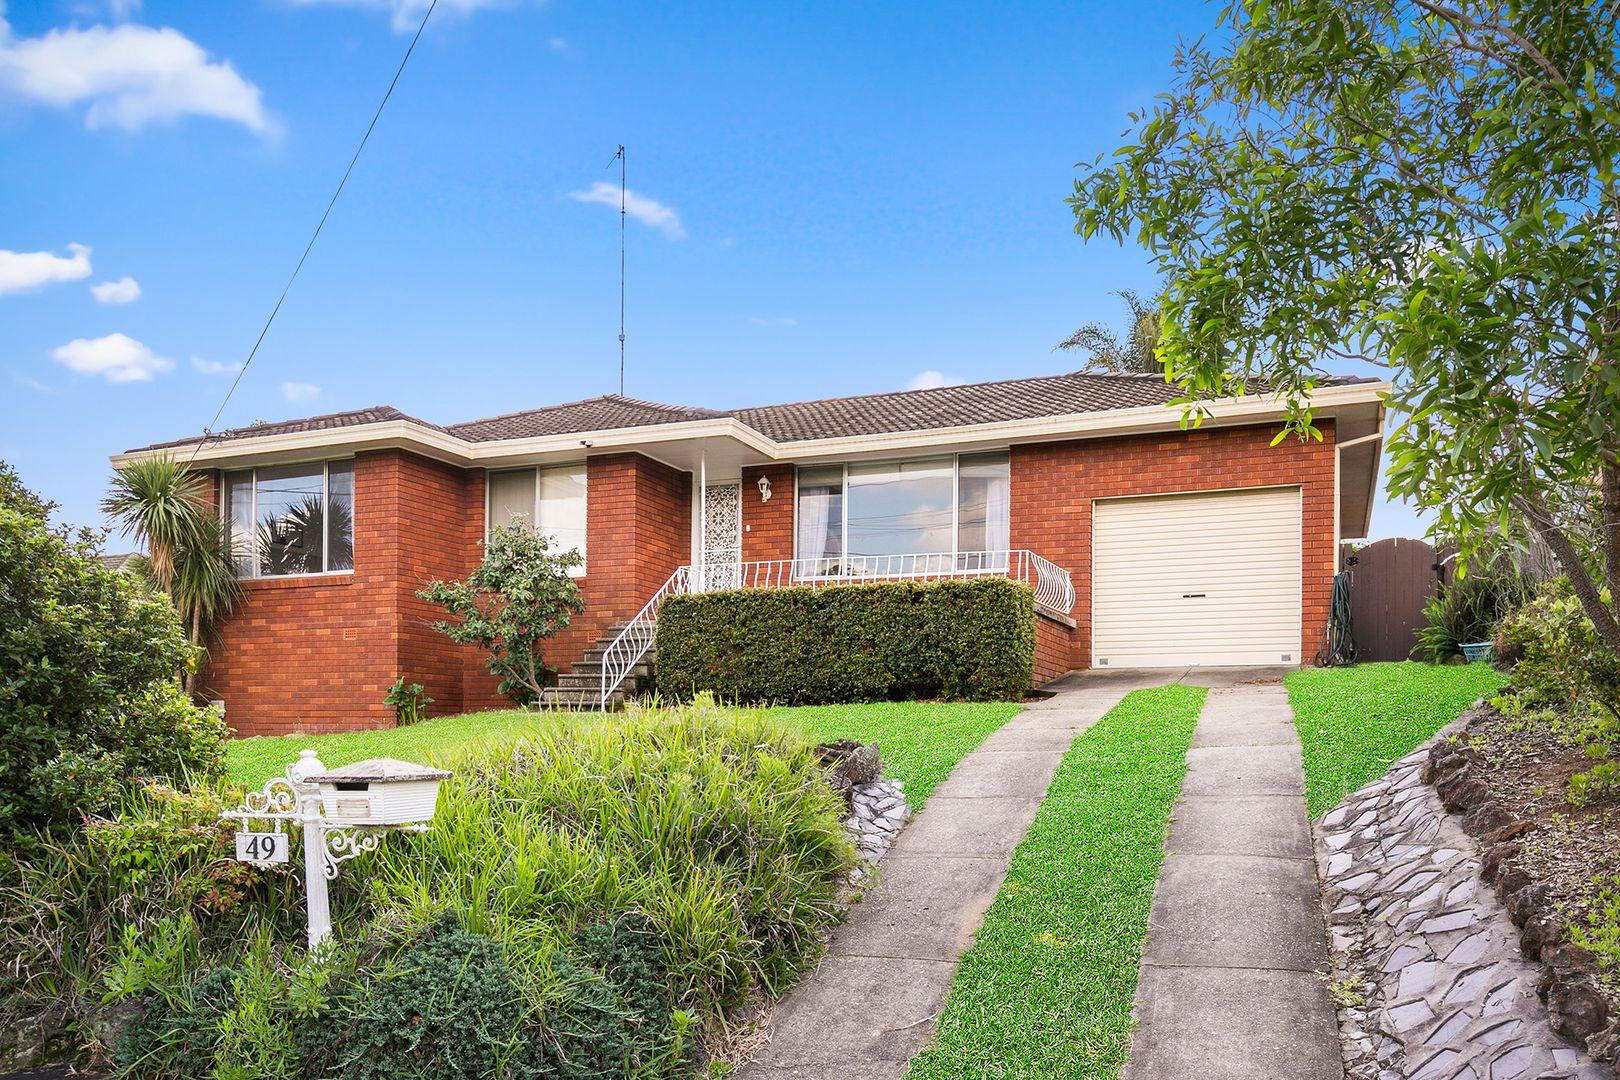 49 Baulkham Hills  Road, Baulkham Hills NSW 2153, Image 0